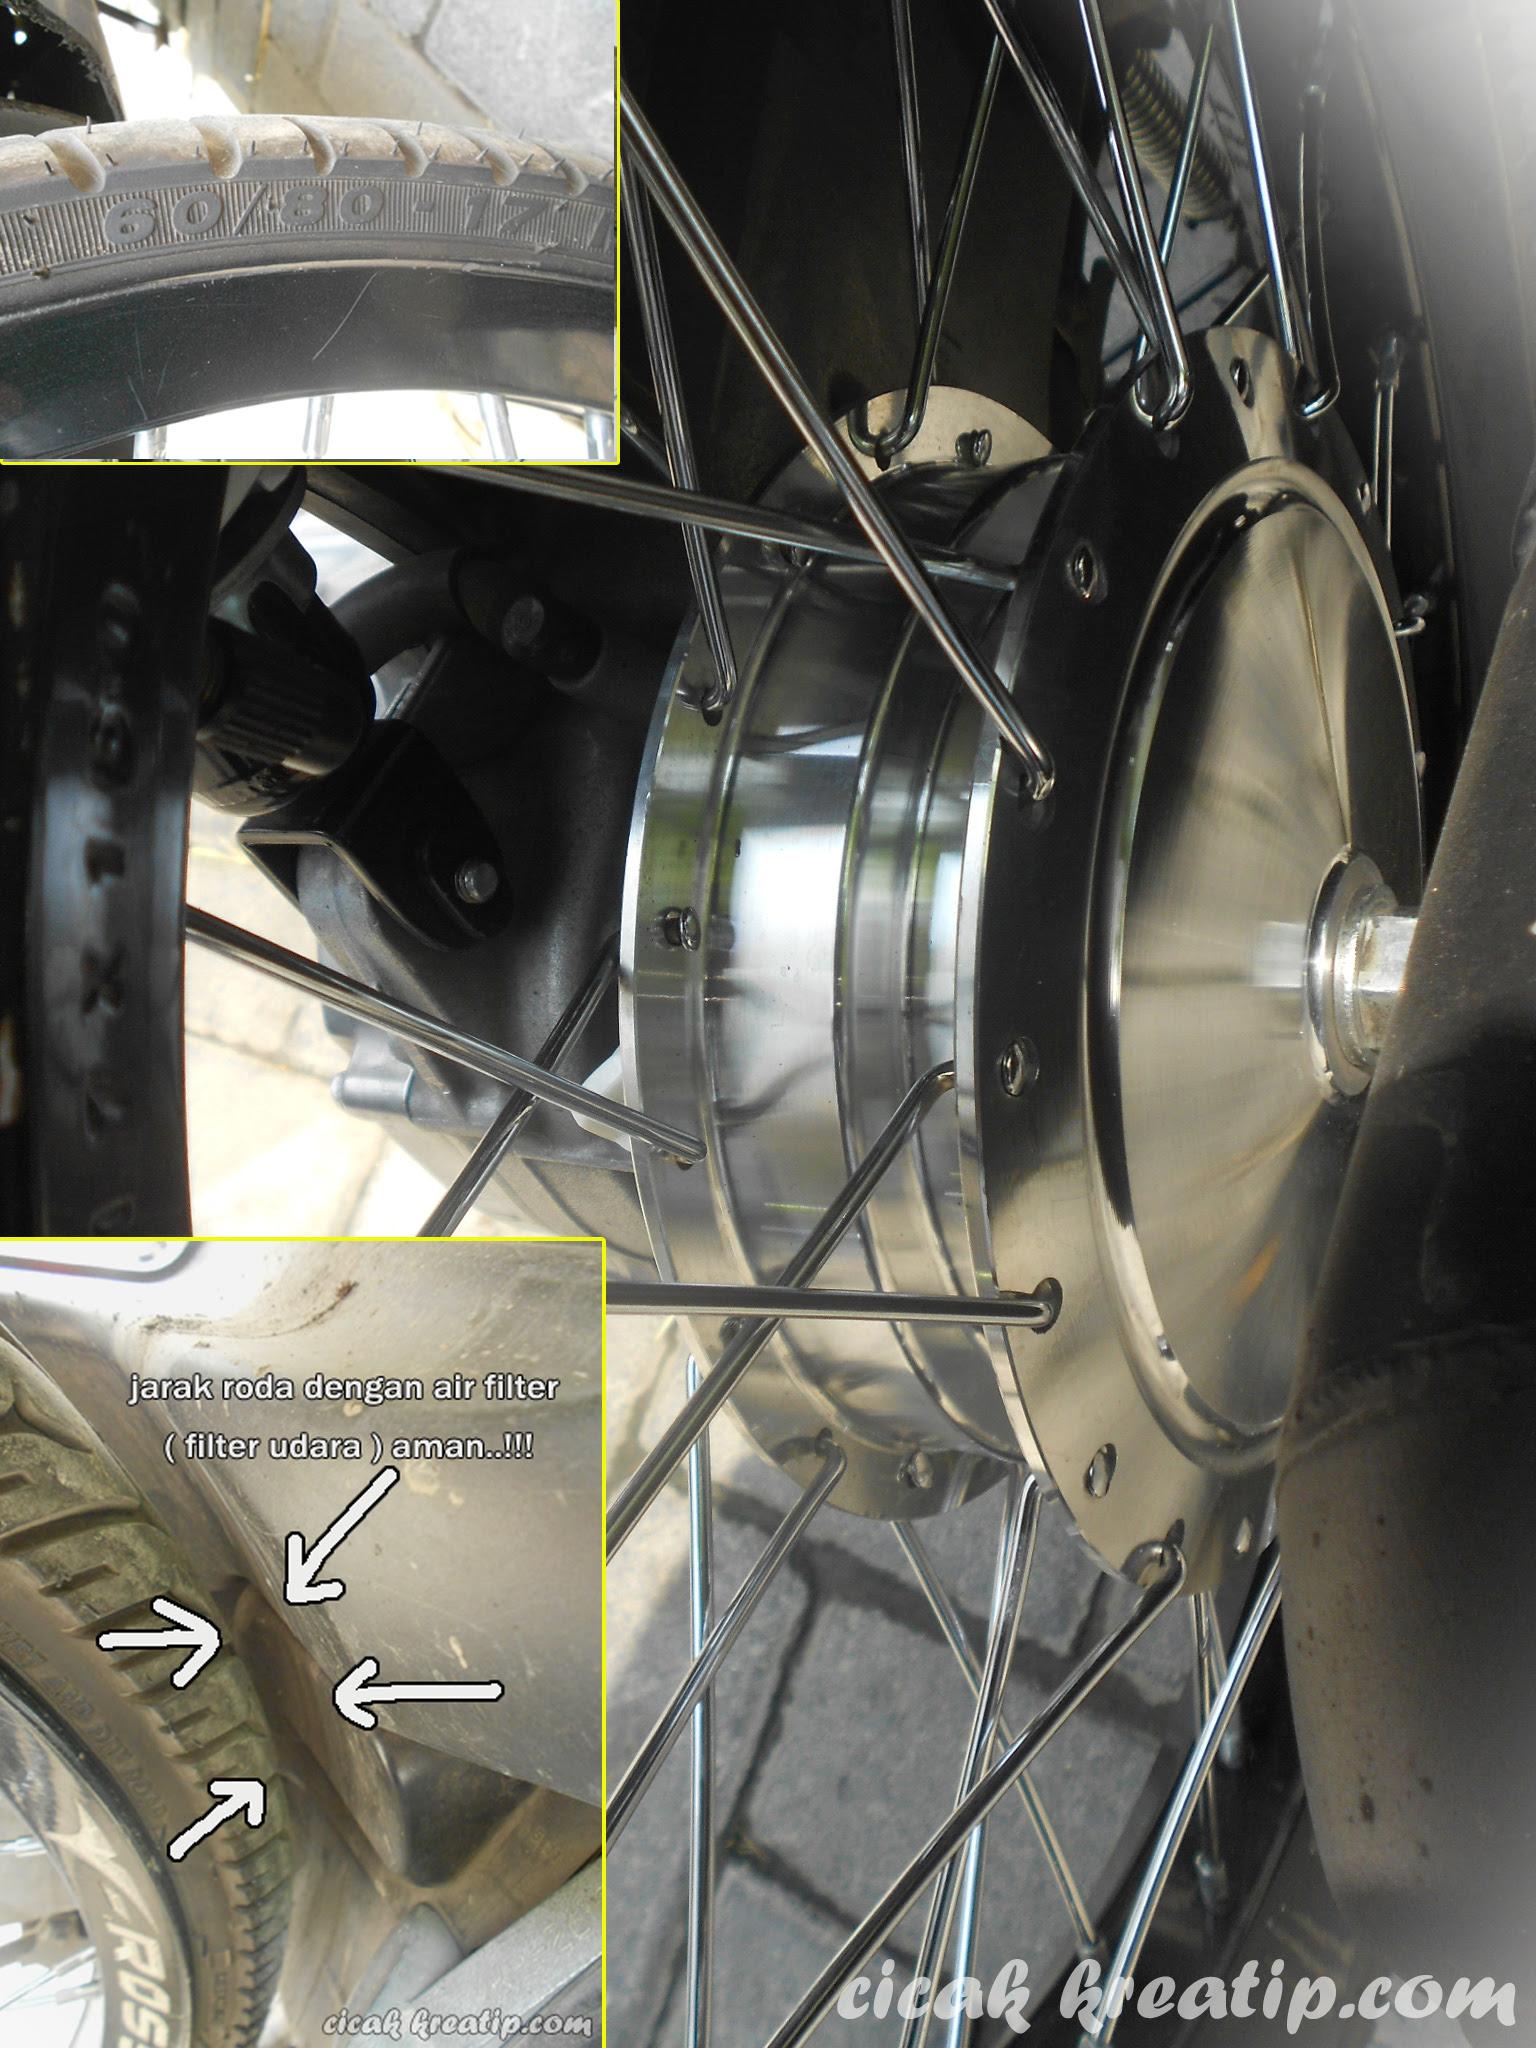 Modifikasi Motor Mio Cakram Belakang Pecinta Shock Breaker Sporty Soul M3 Gt Bluecore Z Fino Xeon Series Motogp Yamaha Pakai Velg 17 Dan X Ride